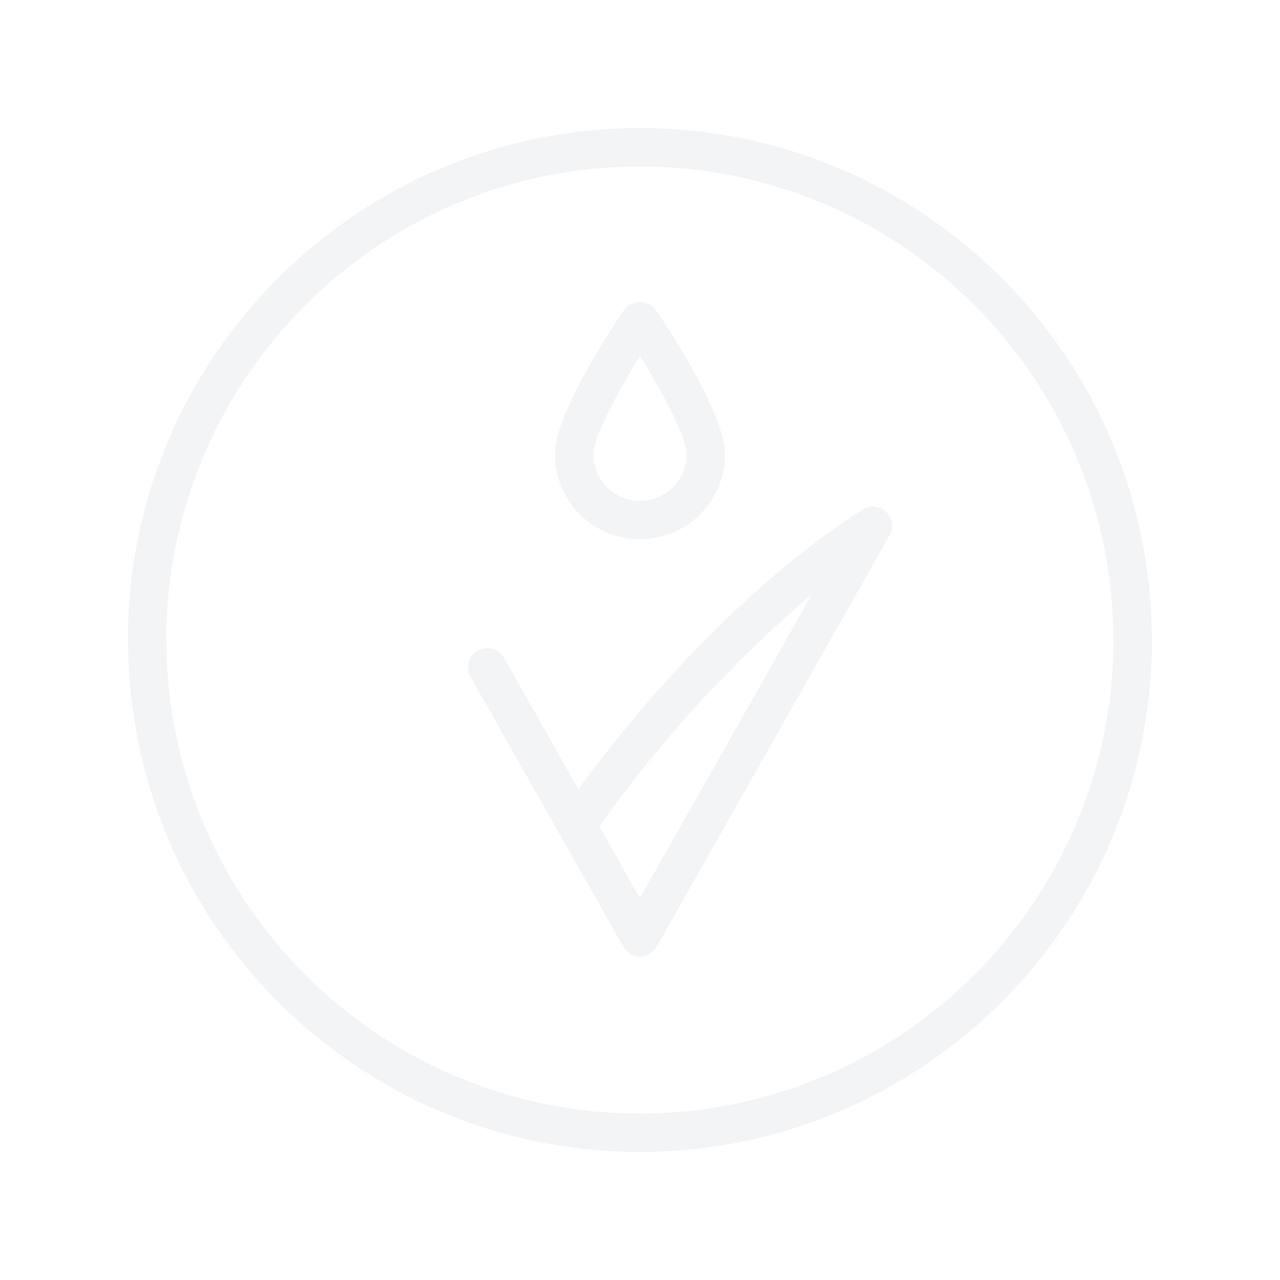 Dior Addict It-Lash Mascara No.092 It-Black 9ml